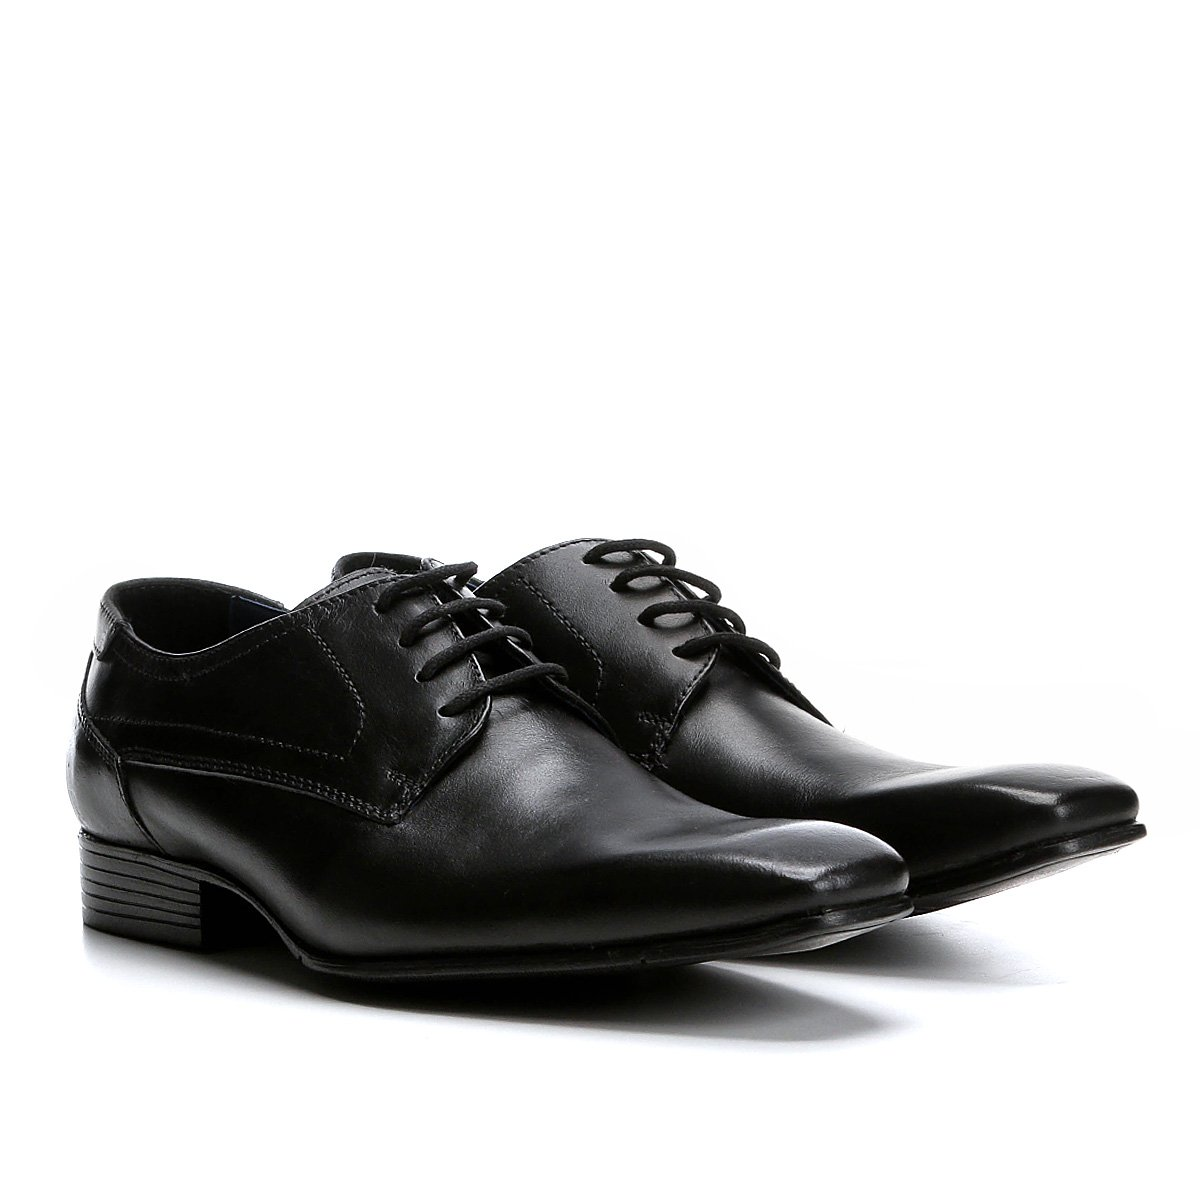 4ae85988e3 Sapato Social Couro Walkabout Derby Florença Tradicional Masculino - Compre  Agora